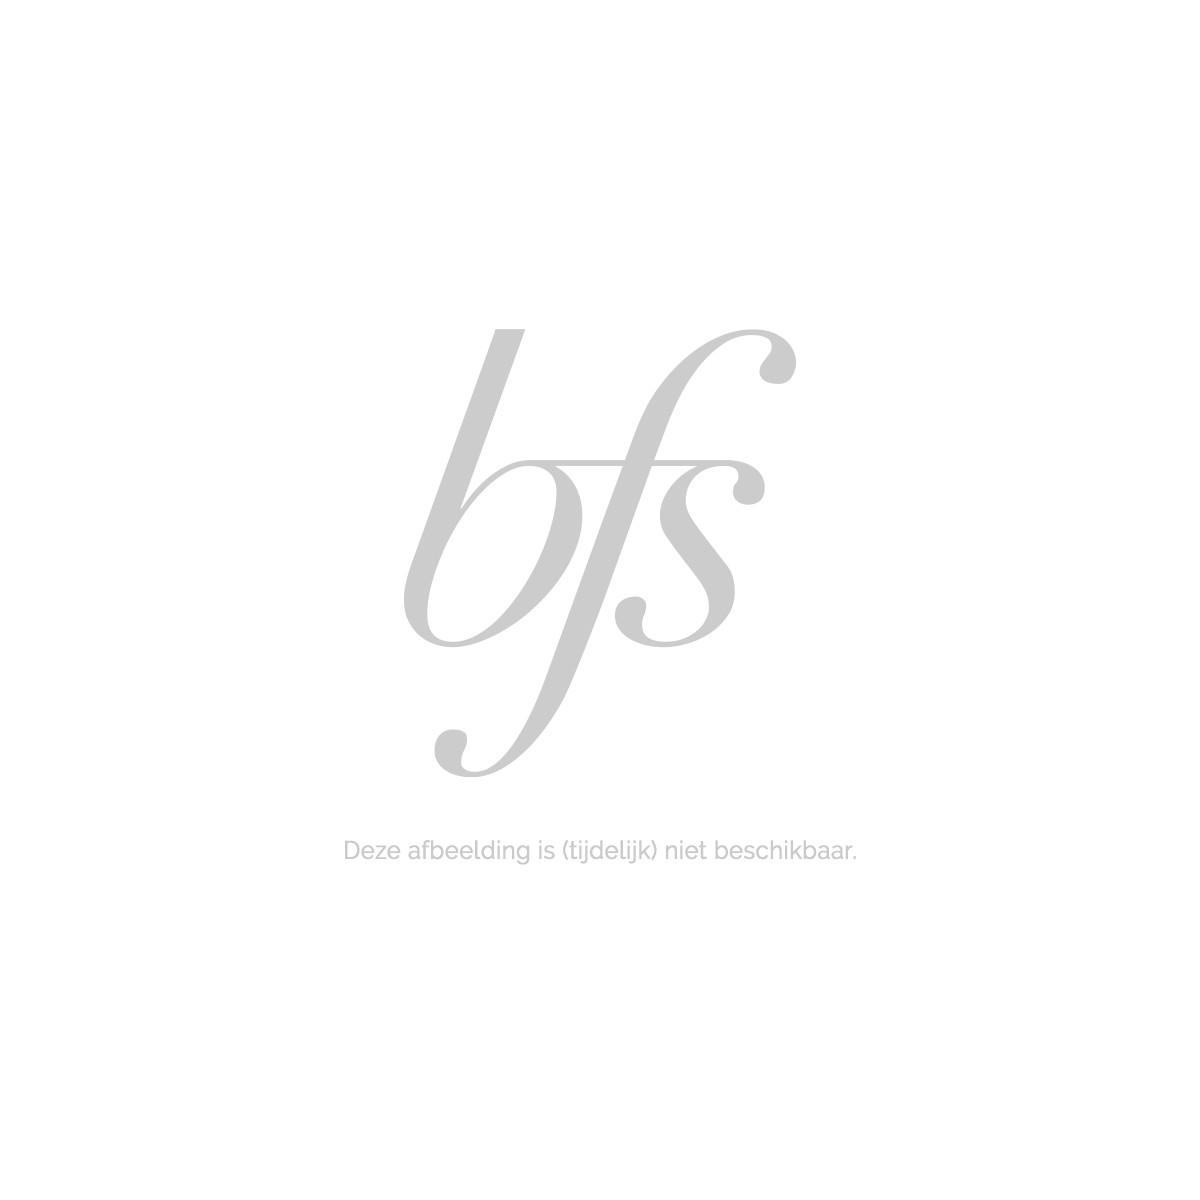 Bourjois Aqua Blush 02 Cocoricorail